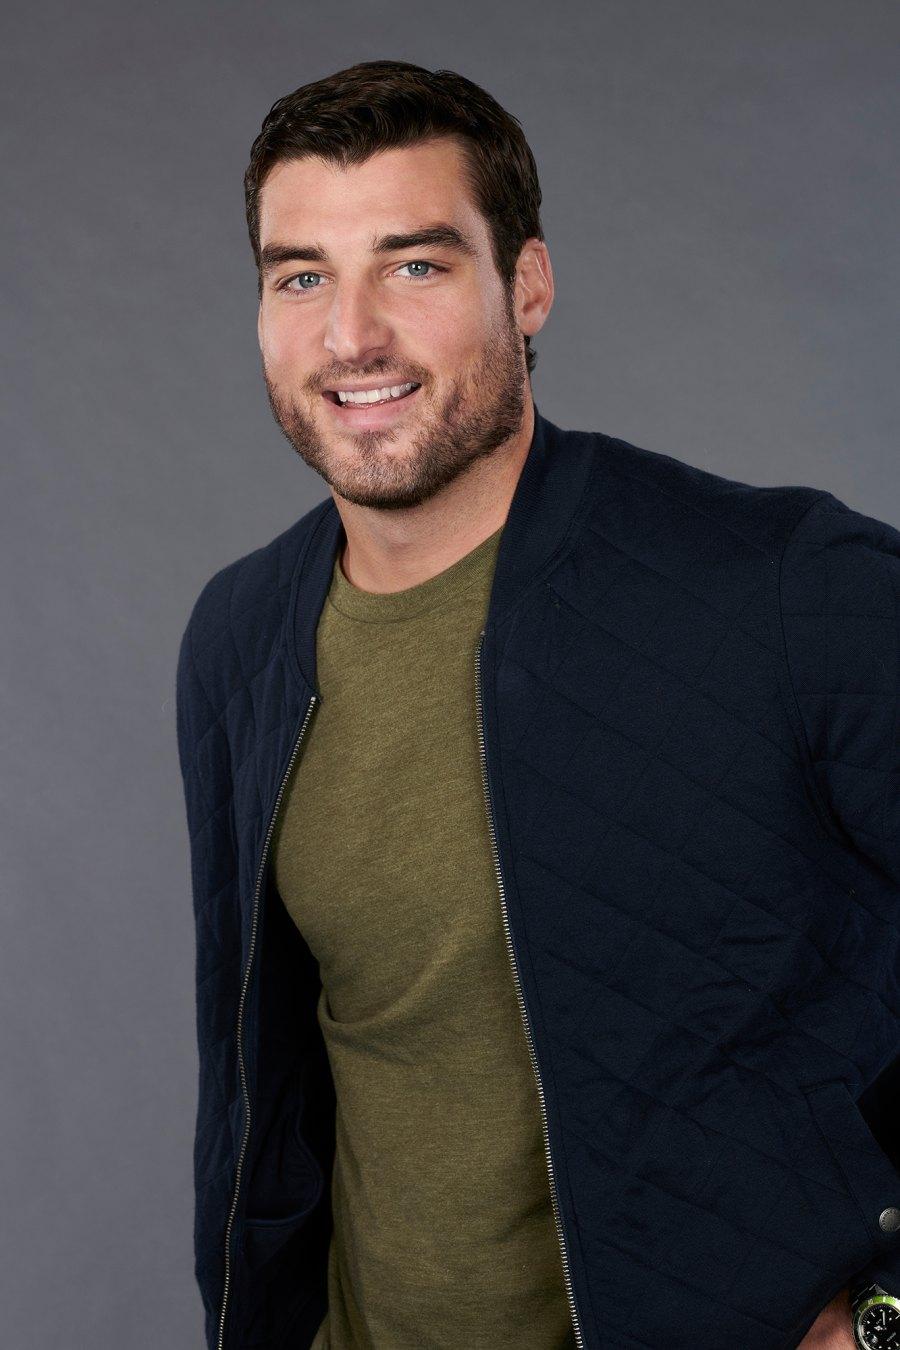 'Bachelorette' Season 15 Alum Tyler Gwozdz Hospitalized After Apparent Overdose